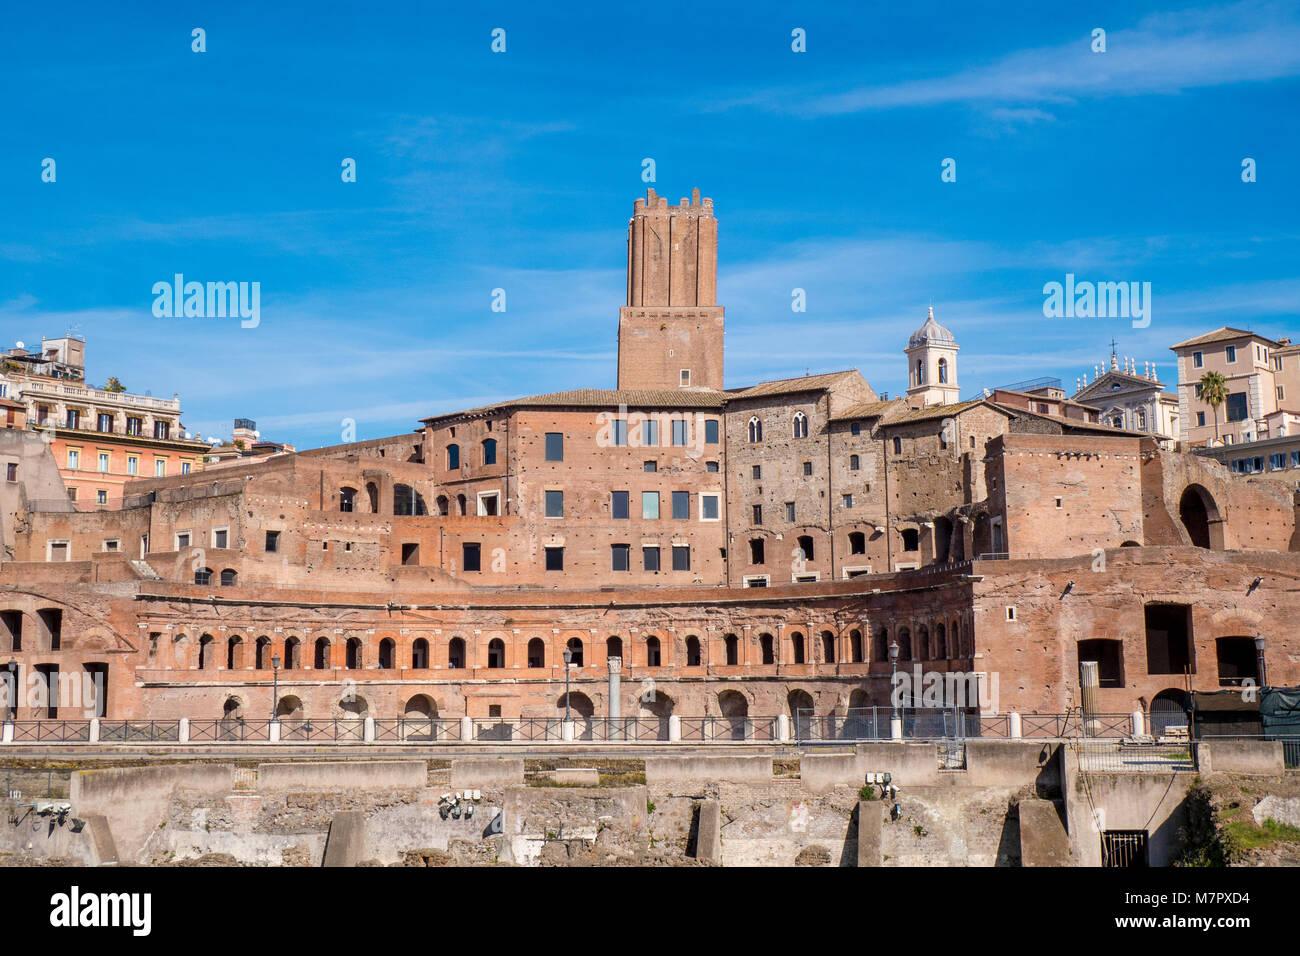 Trajan's Market landmark of Rome, Italy - Stock Image